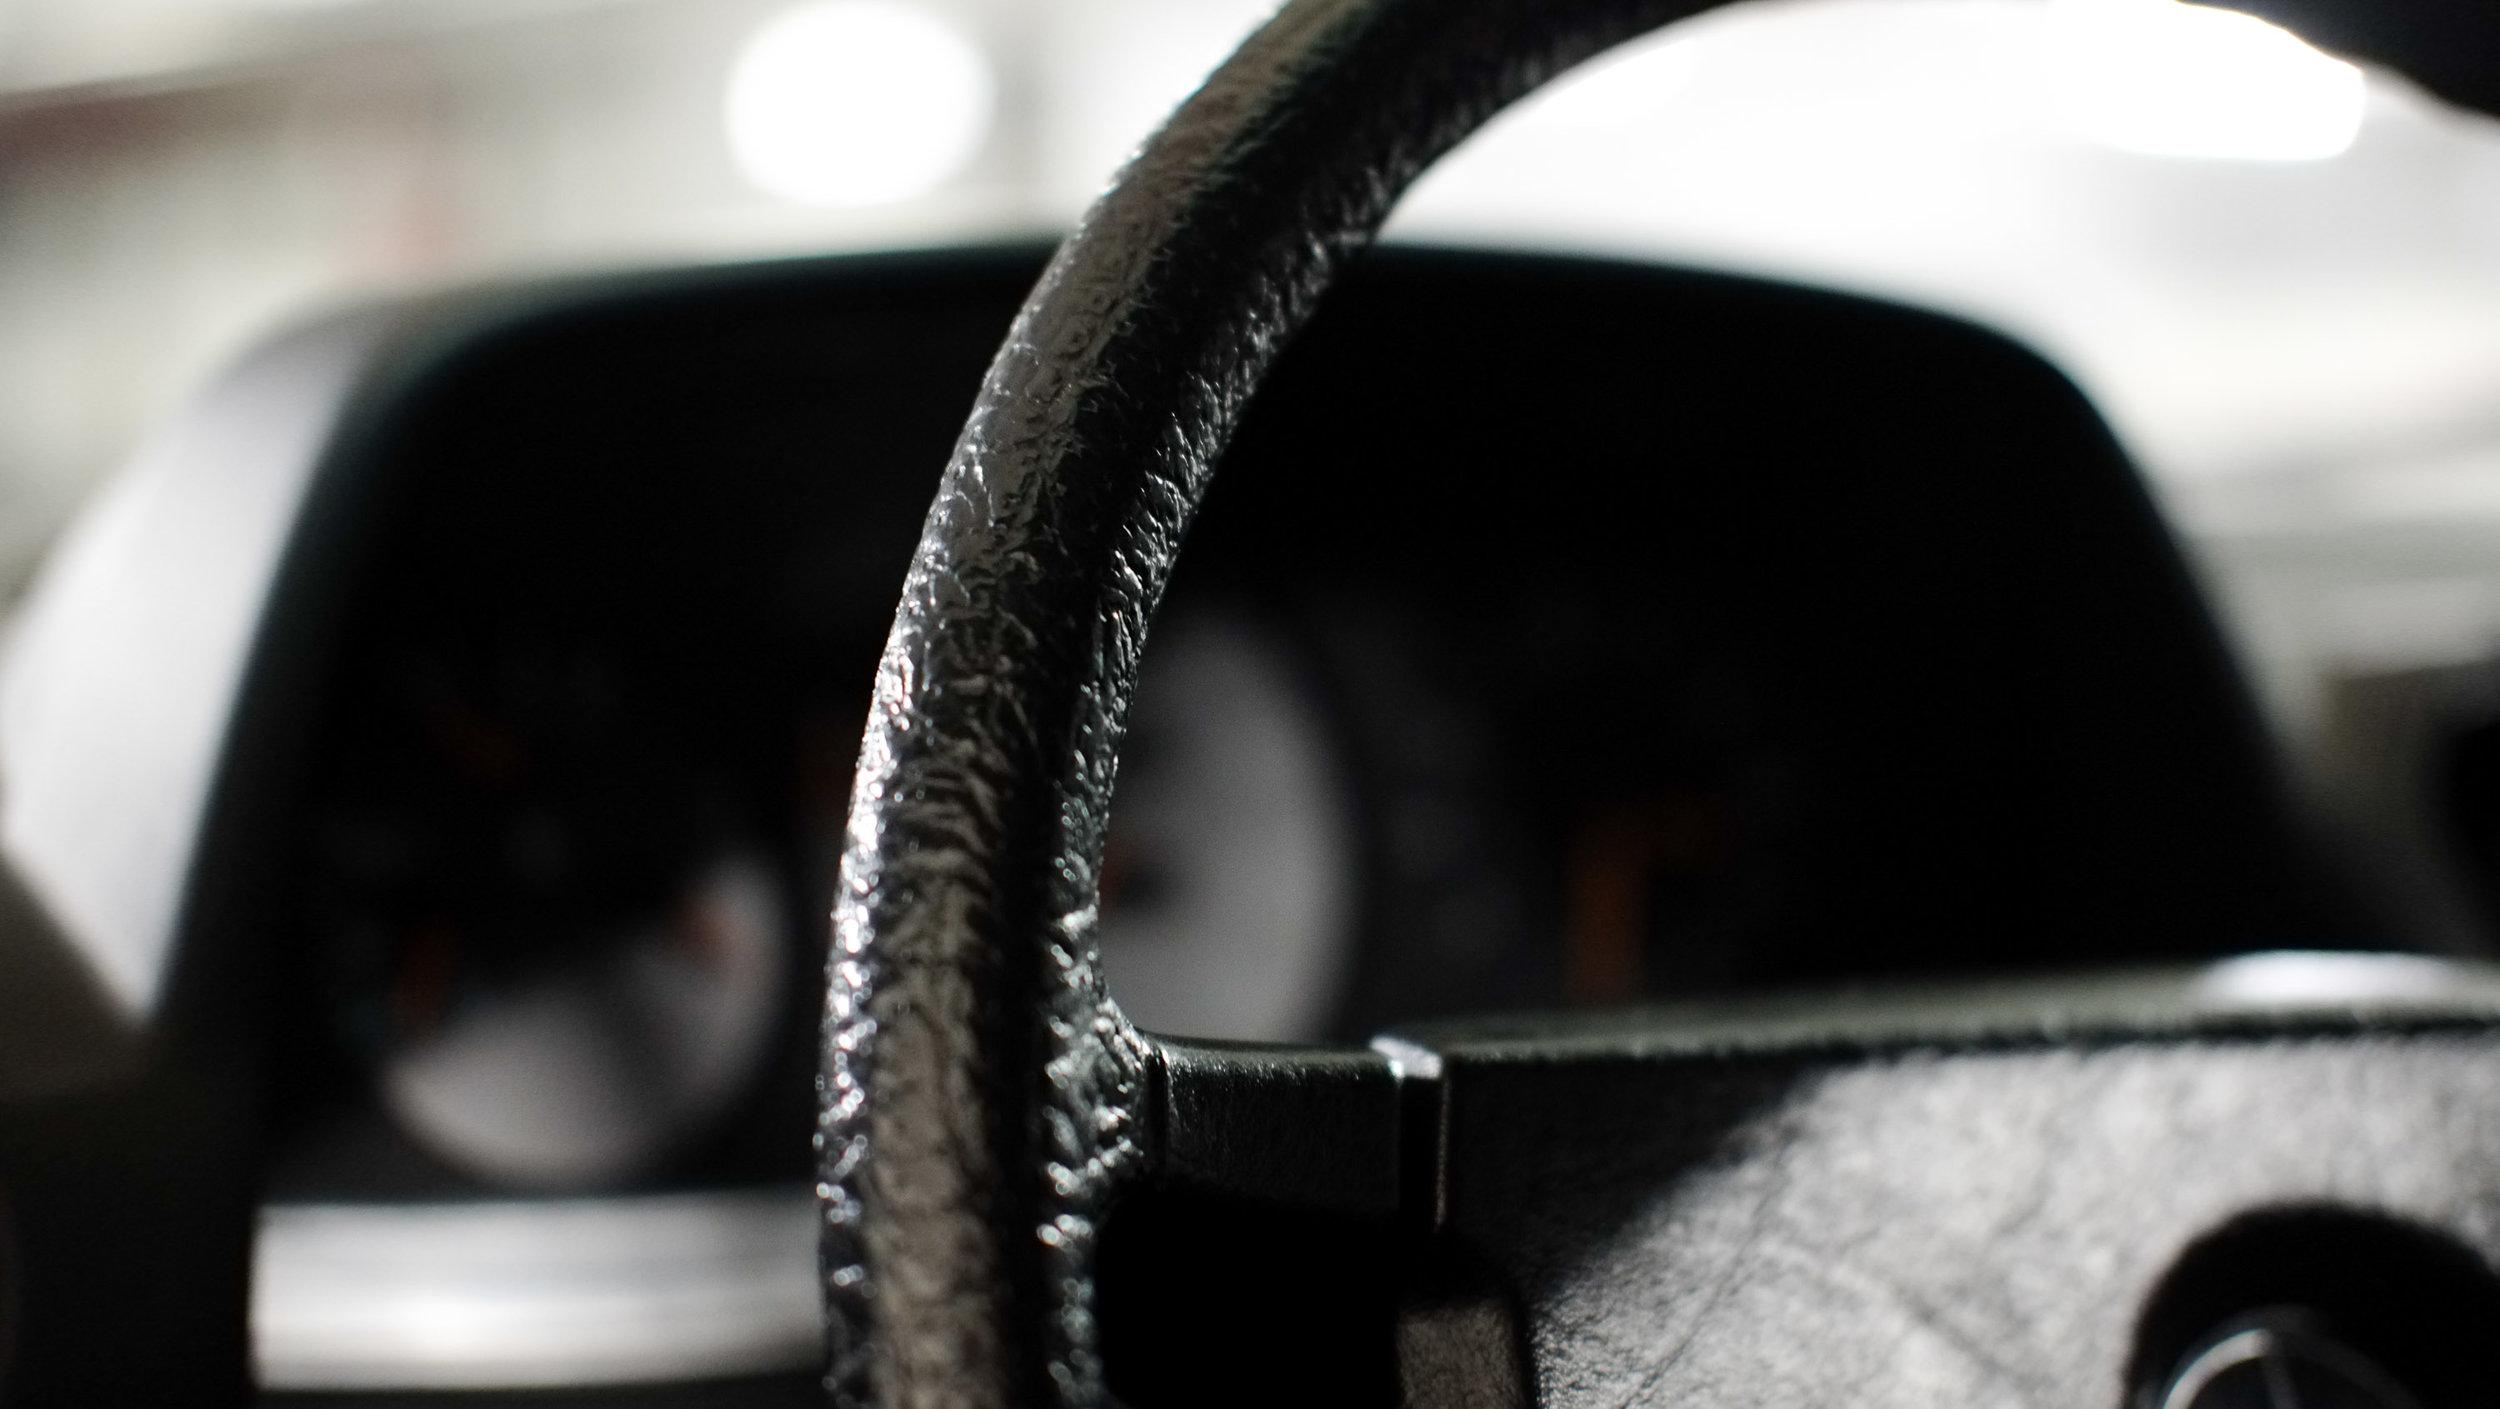 coolnvintage Mercedes-Benz W123 300D (44 of 59).jpg